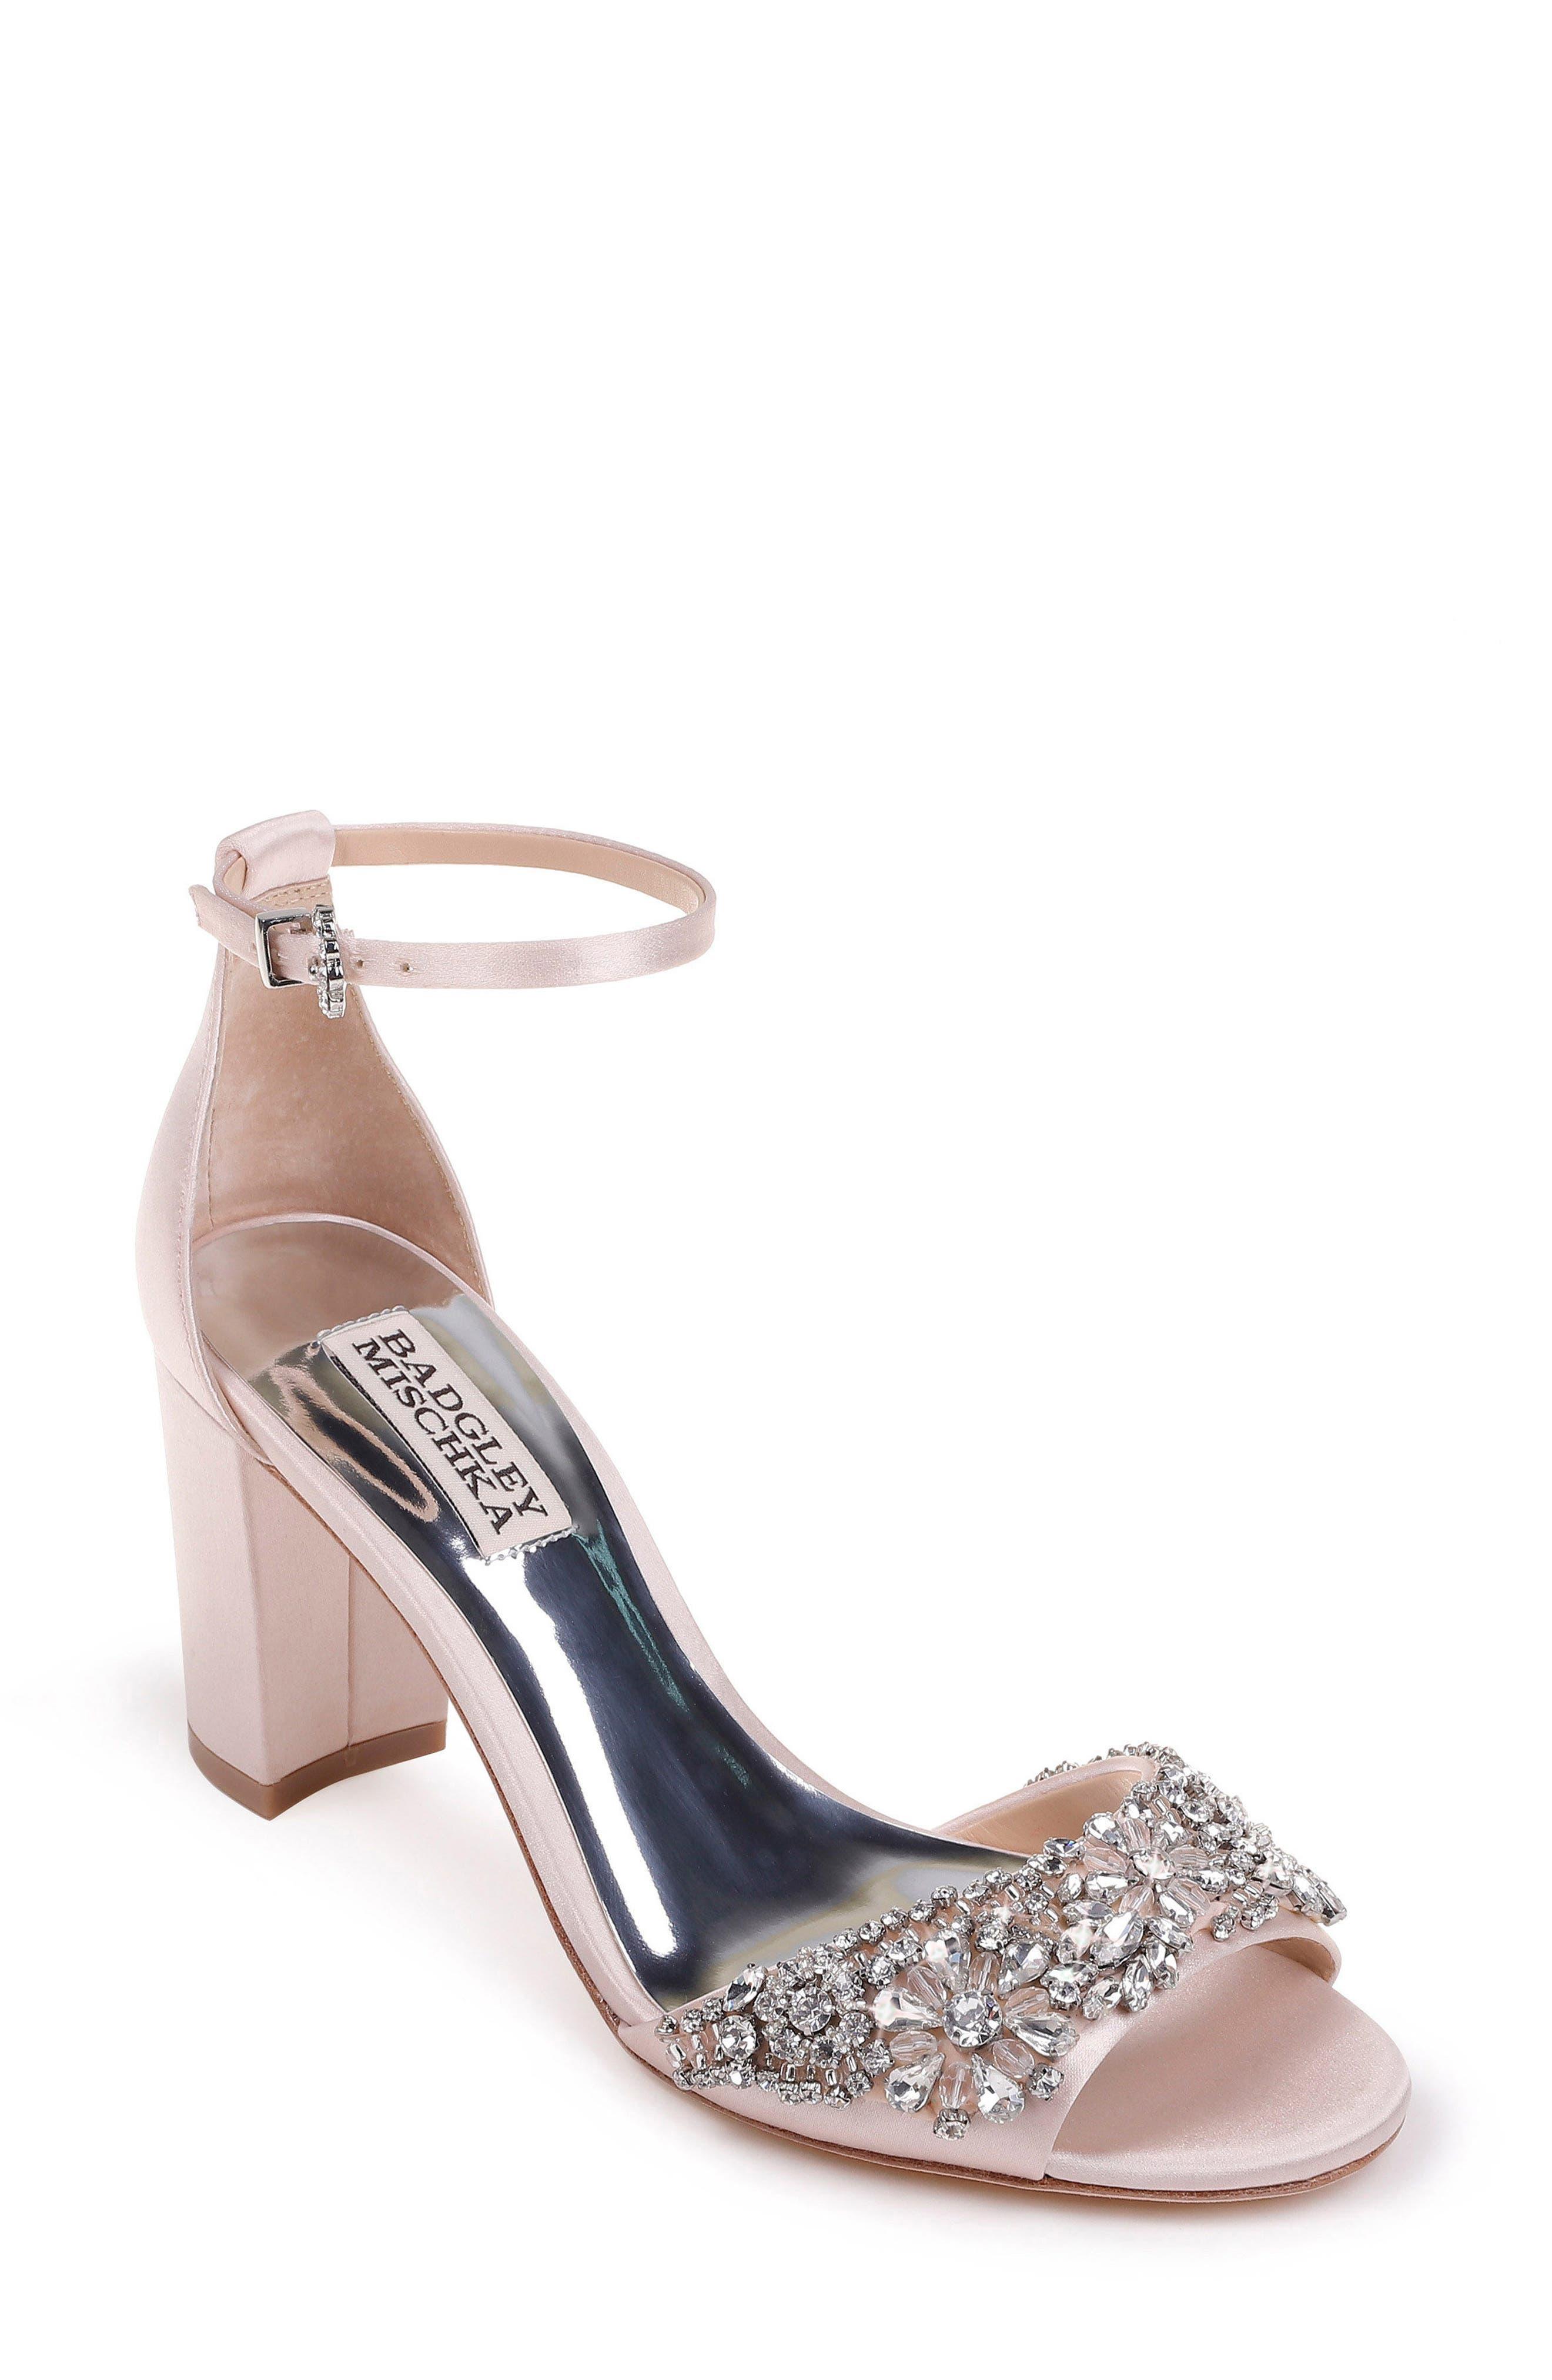 Alternate Image 1 Selected - Badgley Mischka Hines Embellished Block Heel Sandal (Women)